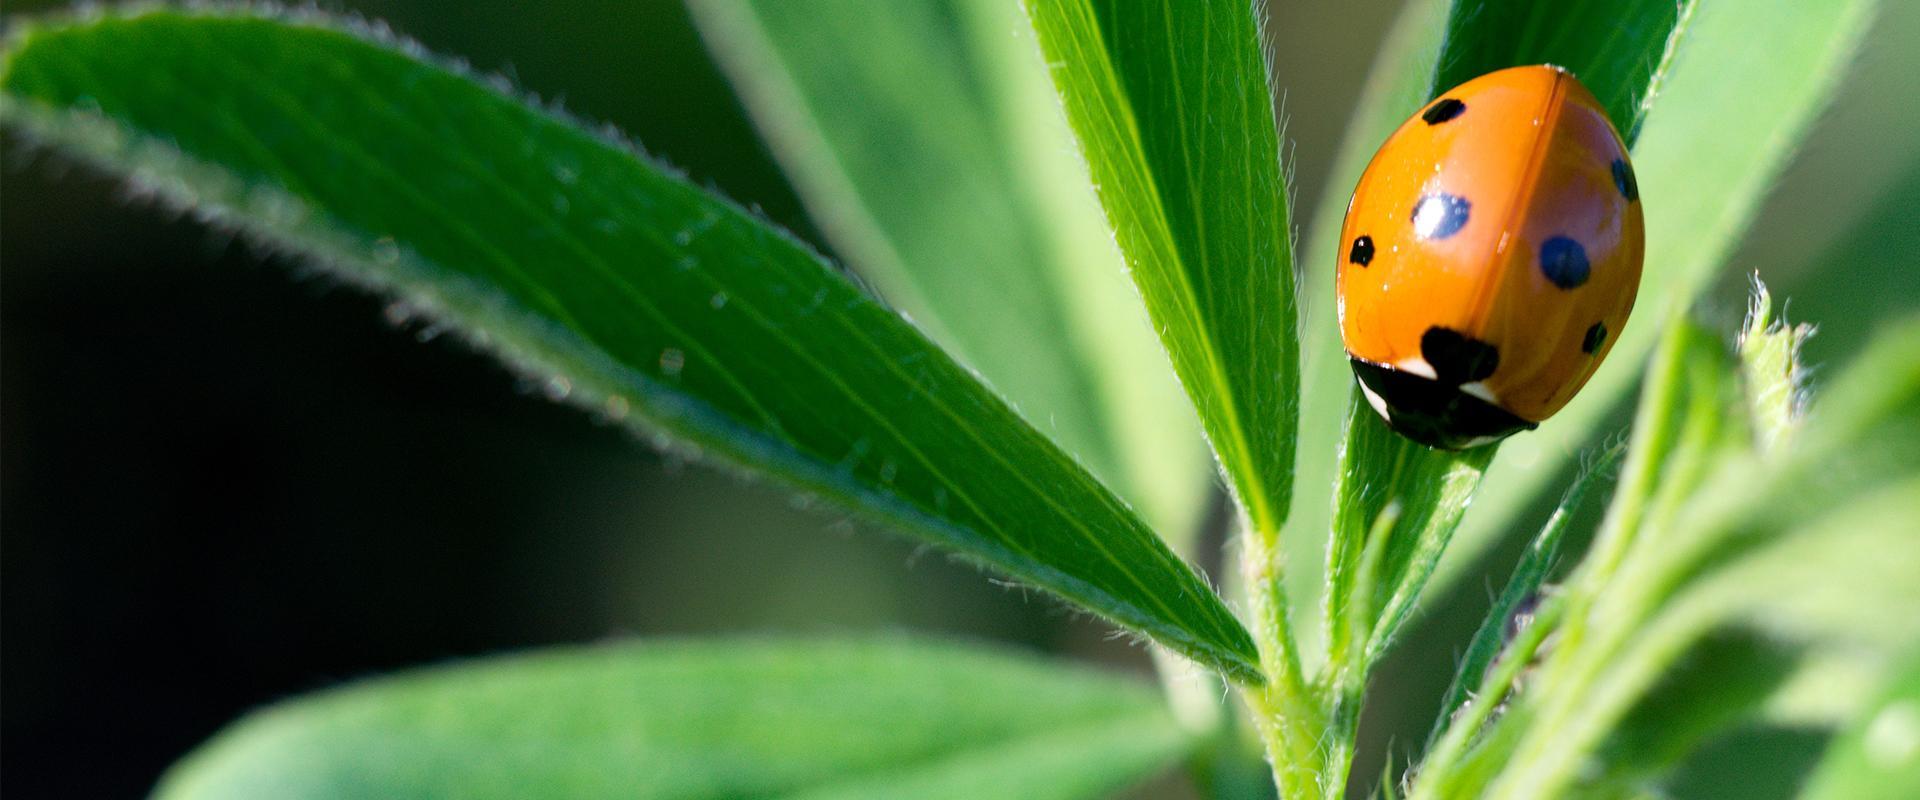 a ladybug crawling on a house plant